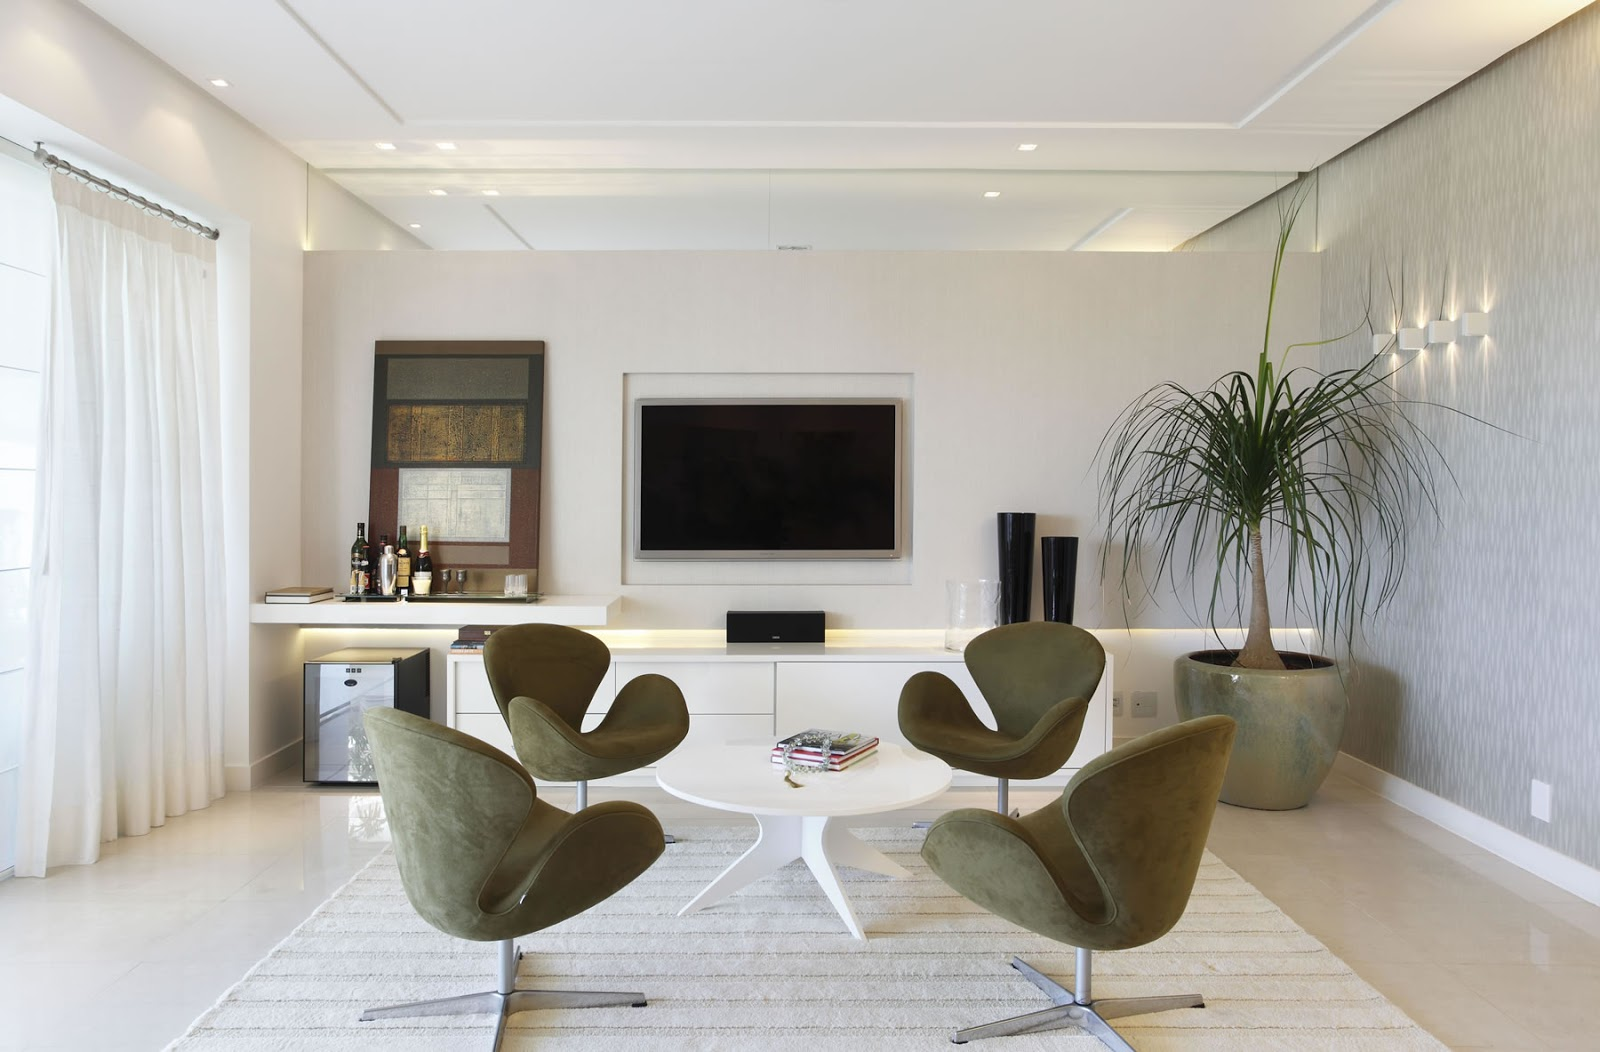 Salas de bate papo integradas s salas de tv tima dica for Sala de estar sims 4